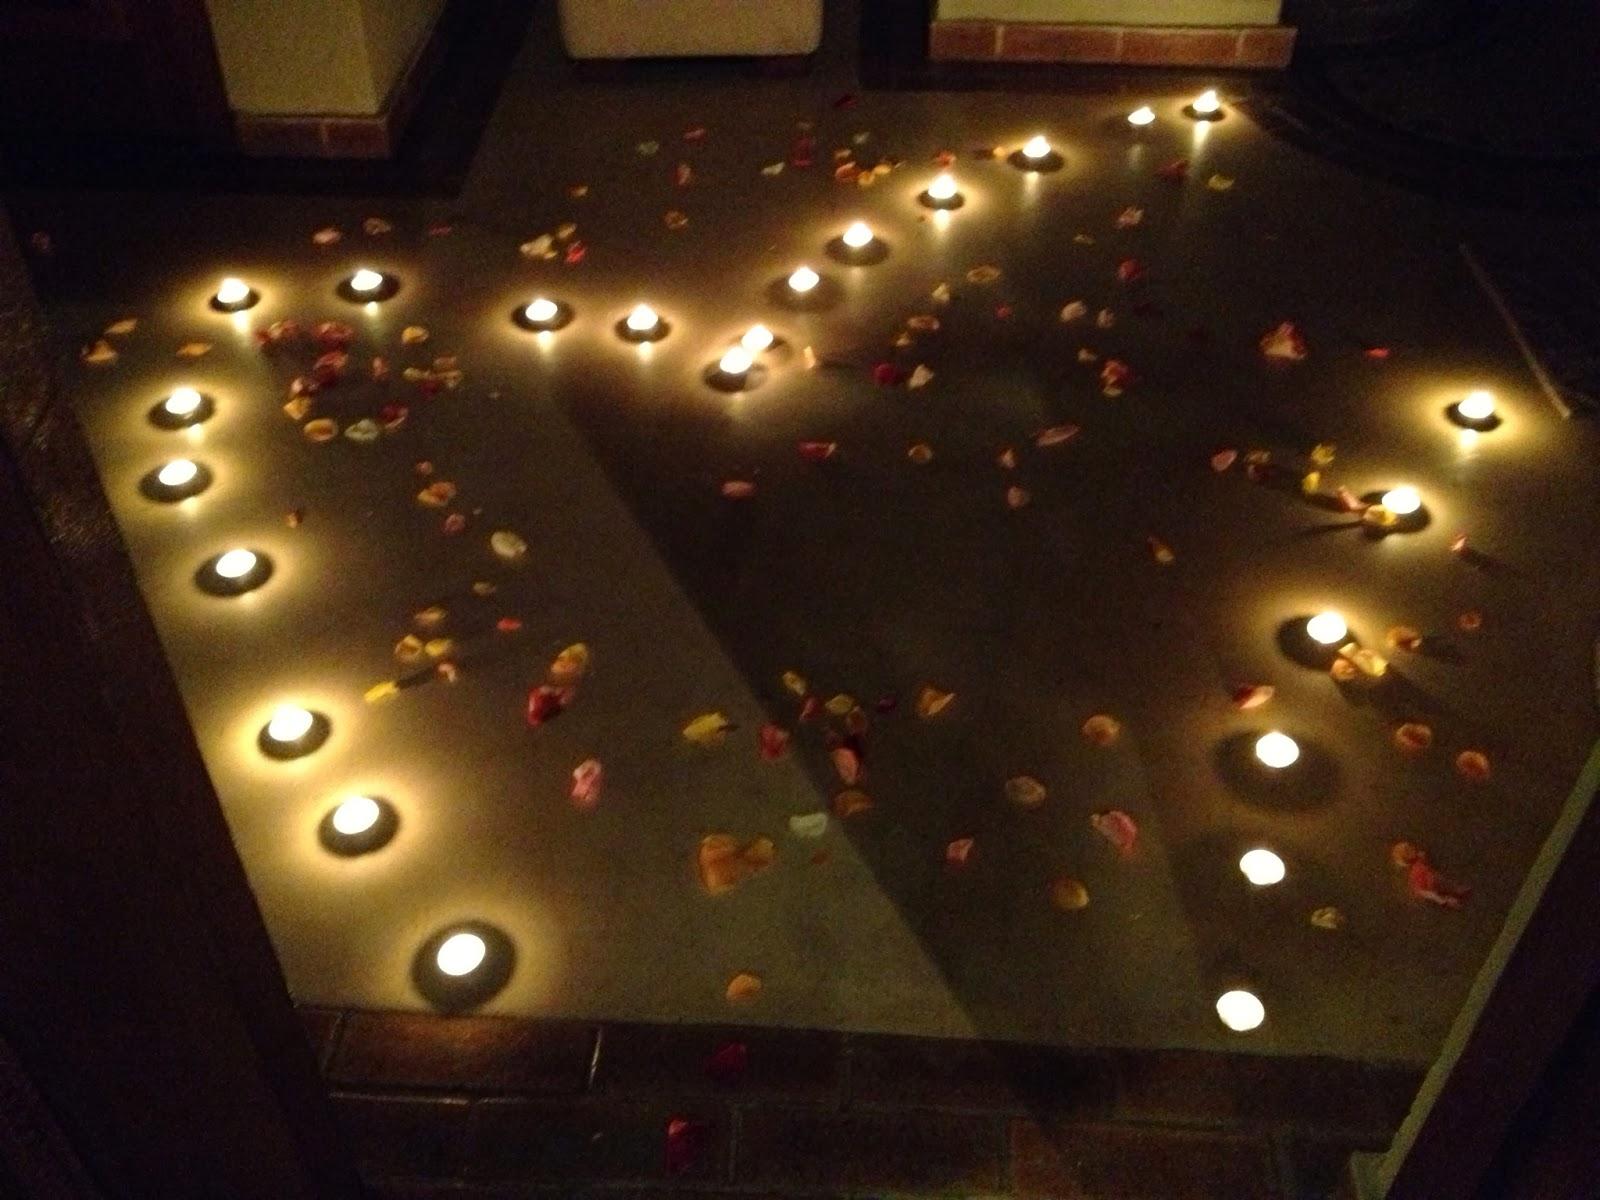 Sabi Sands - Candles everywhere in the bathroom